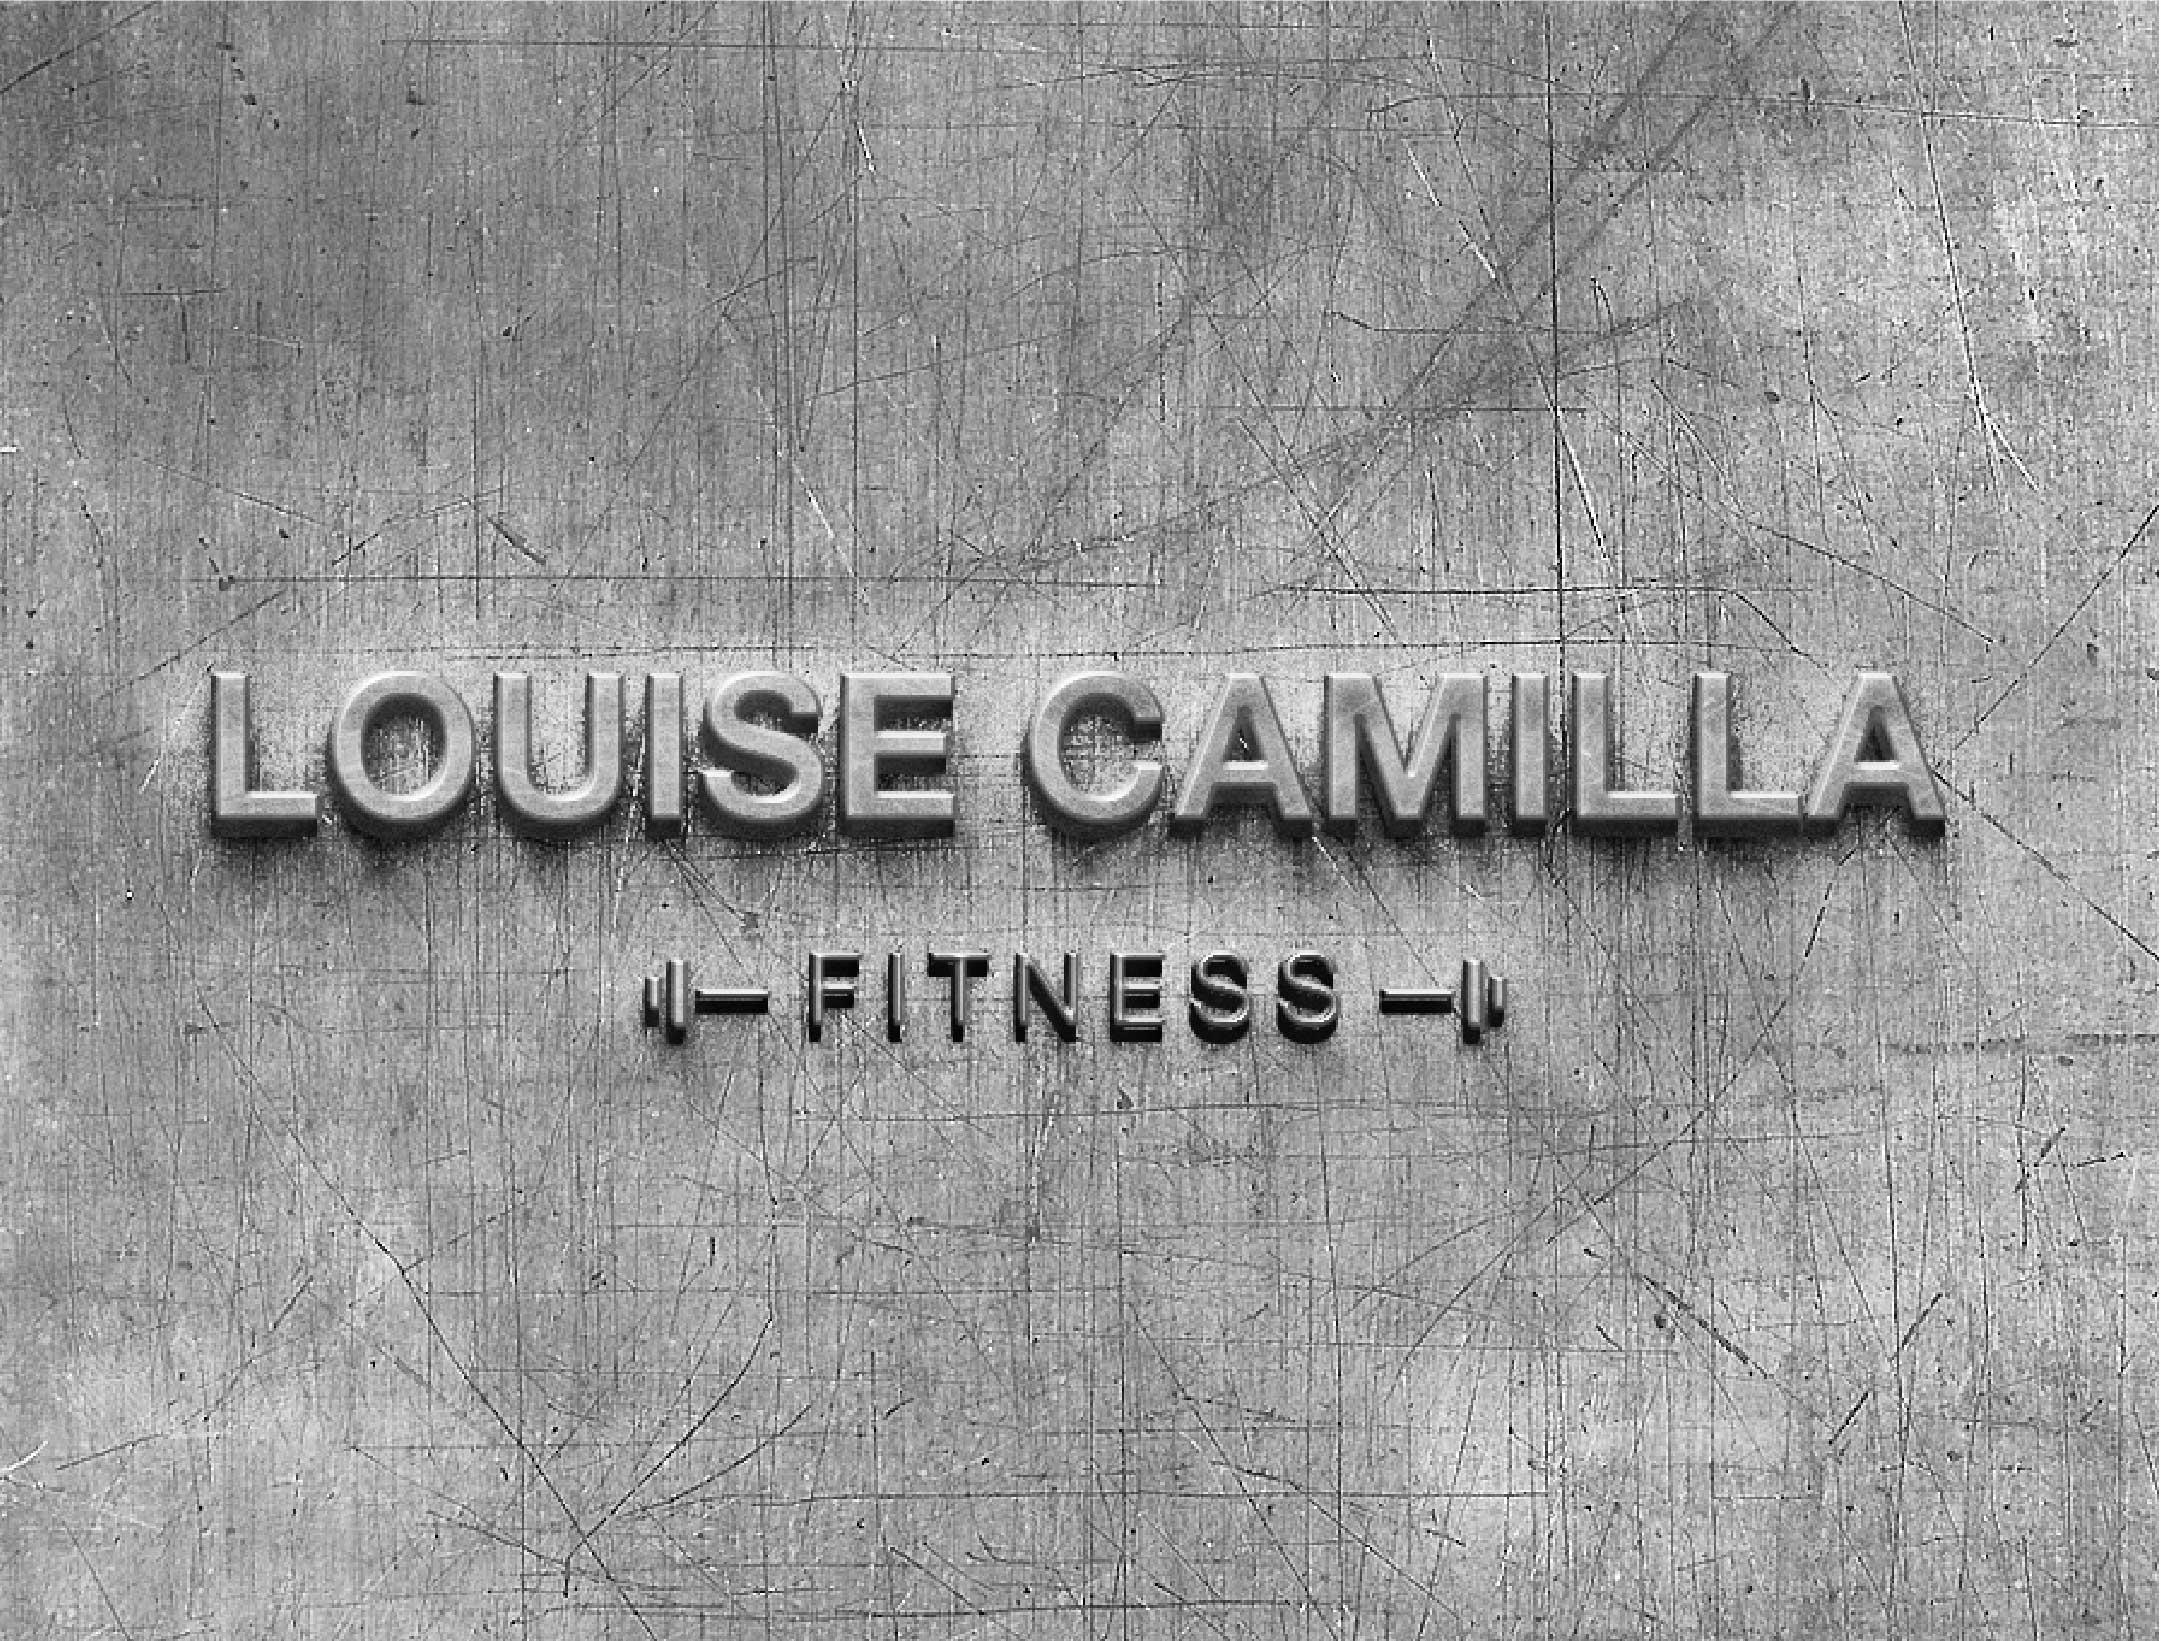 Louise Camilla